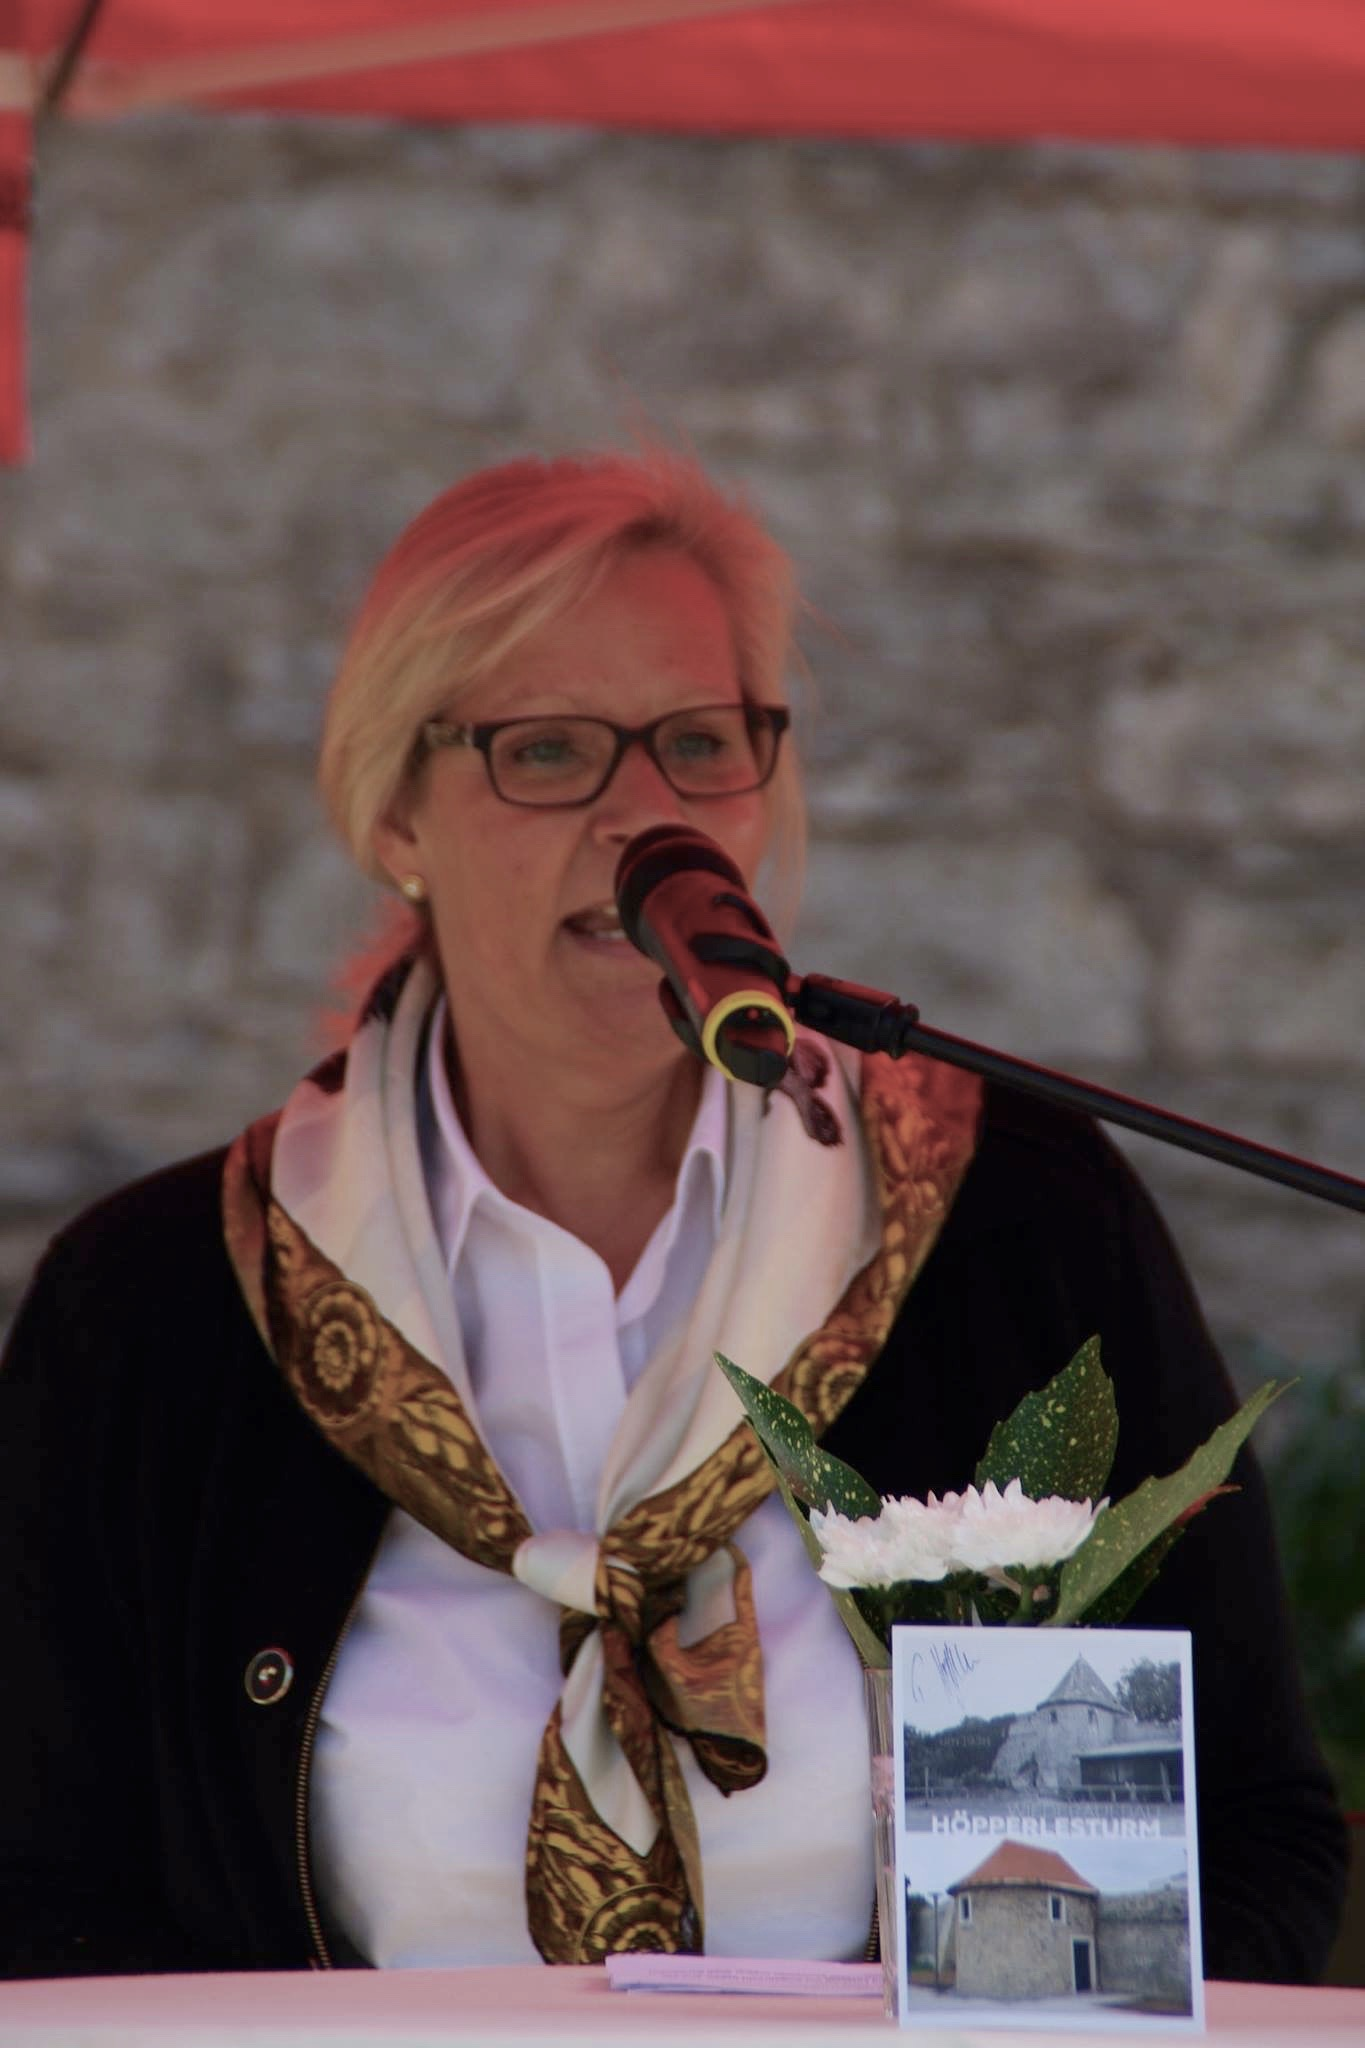 Birgit Kerwer